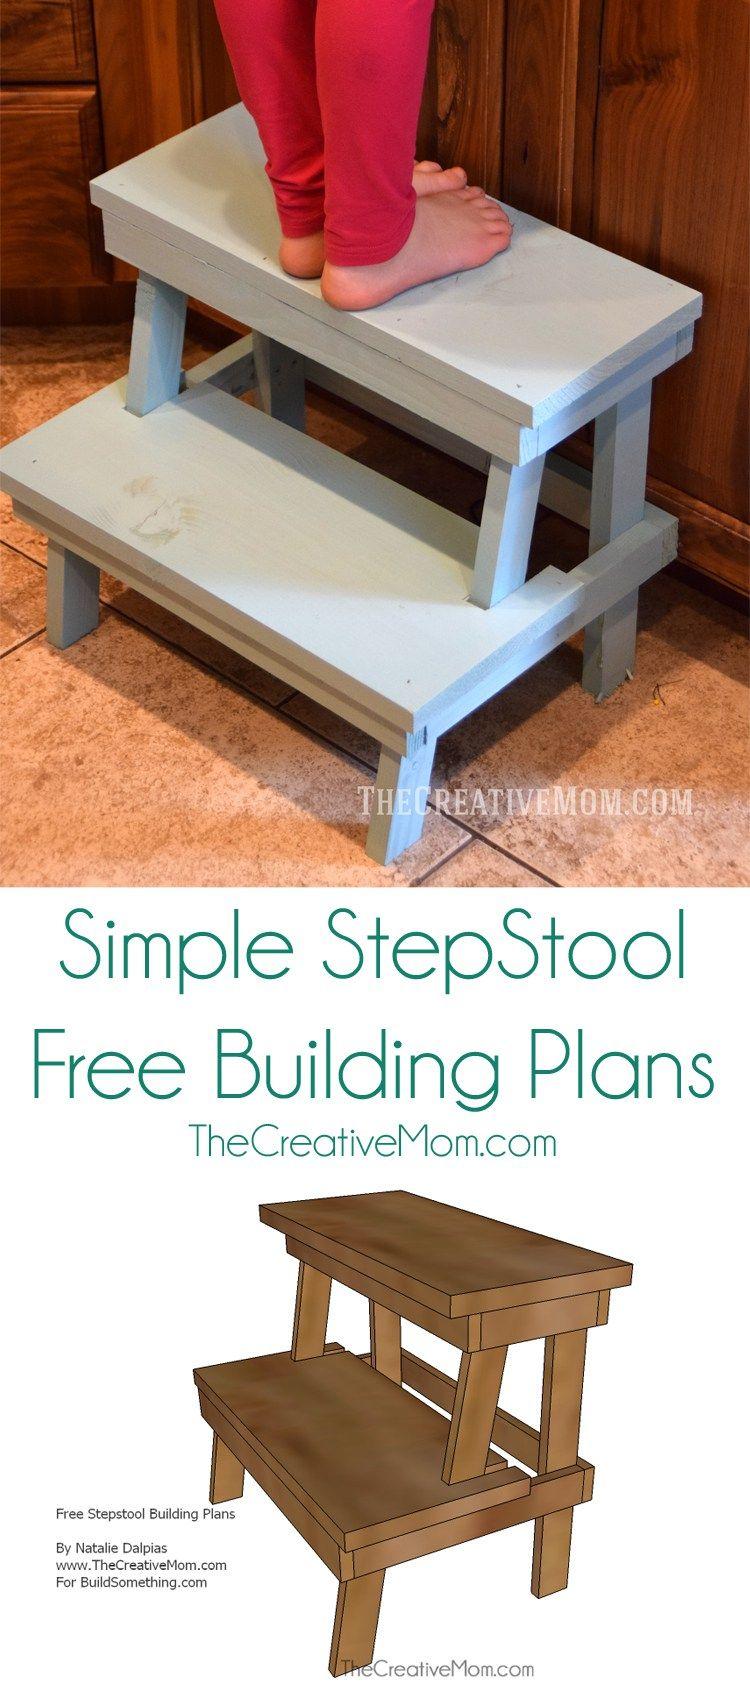 stepstool building plans